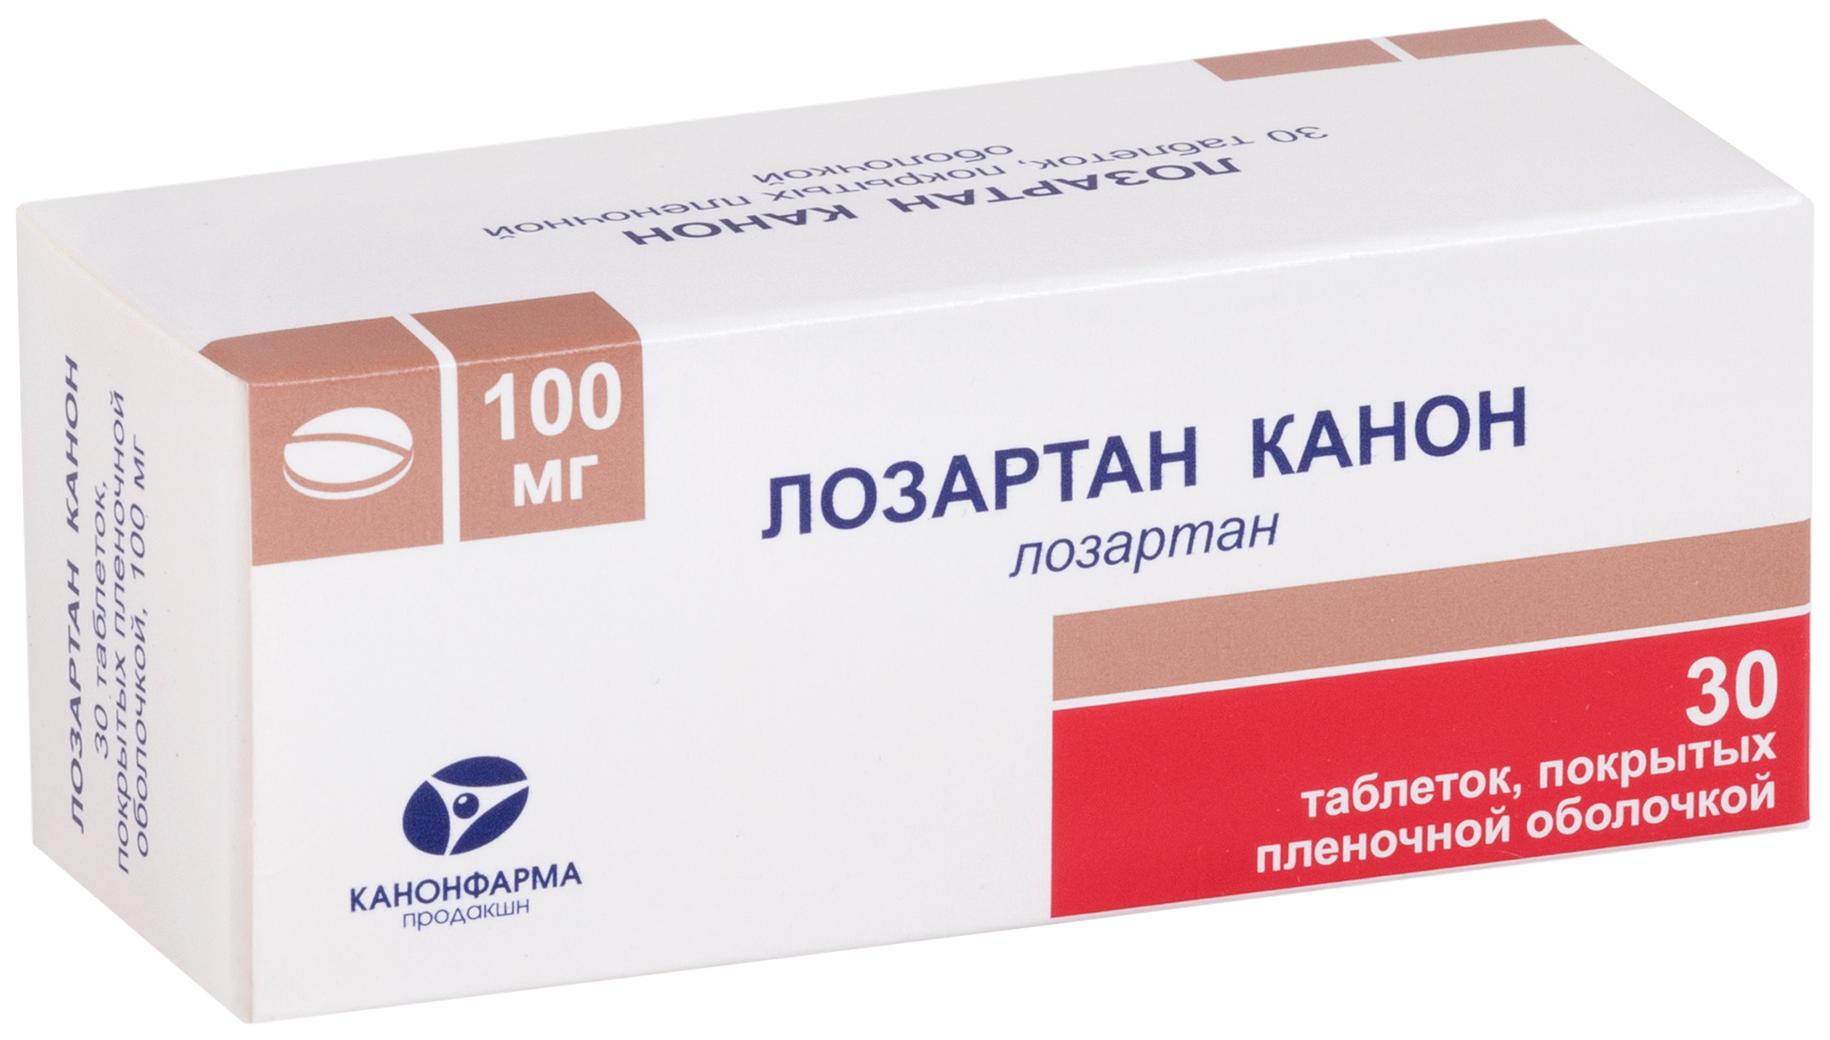 Лозартан Канон таблетки, покрытые пленочной оболочкой 100 мг №30 Канонфарма